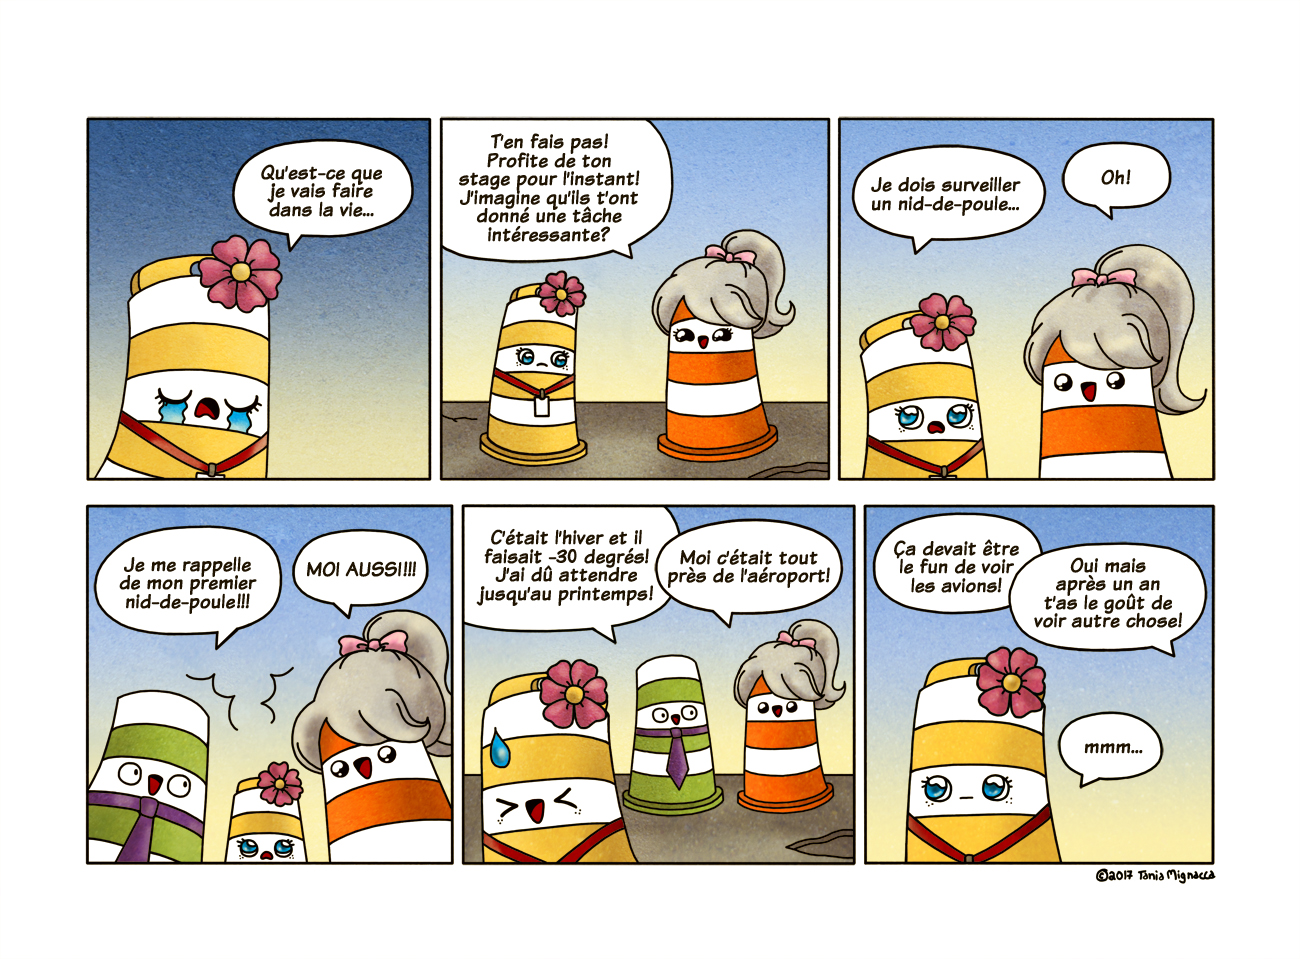 Crise existentielle (Page 241)